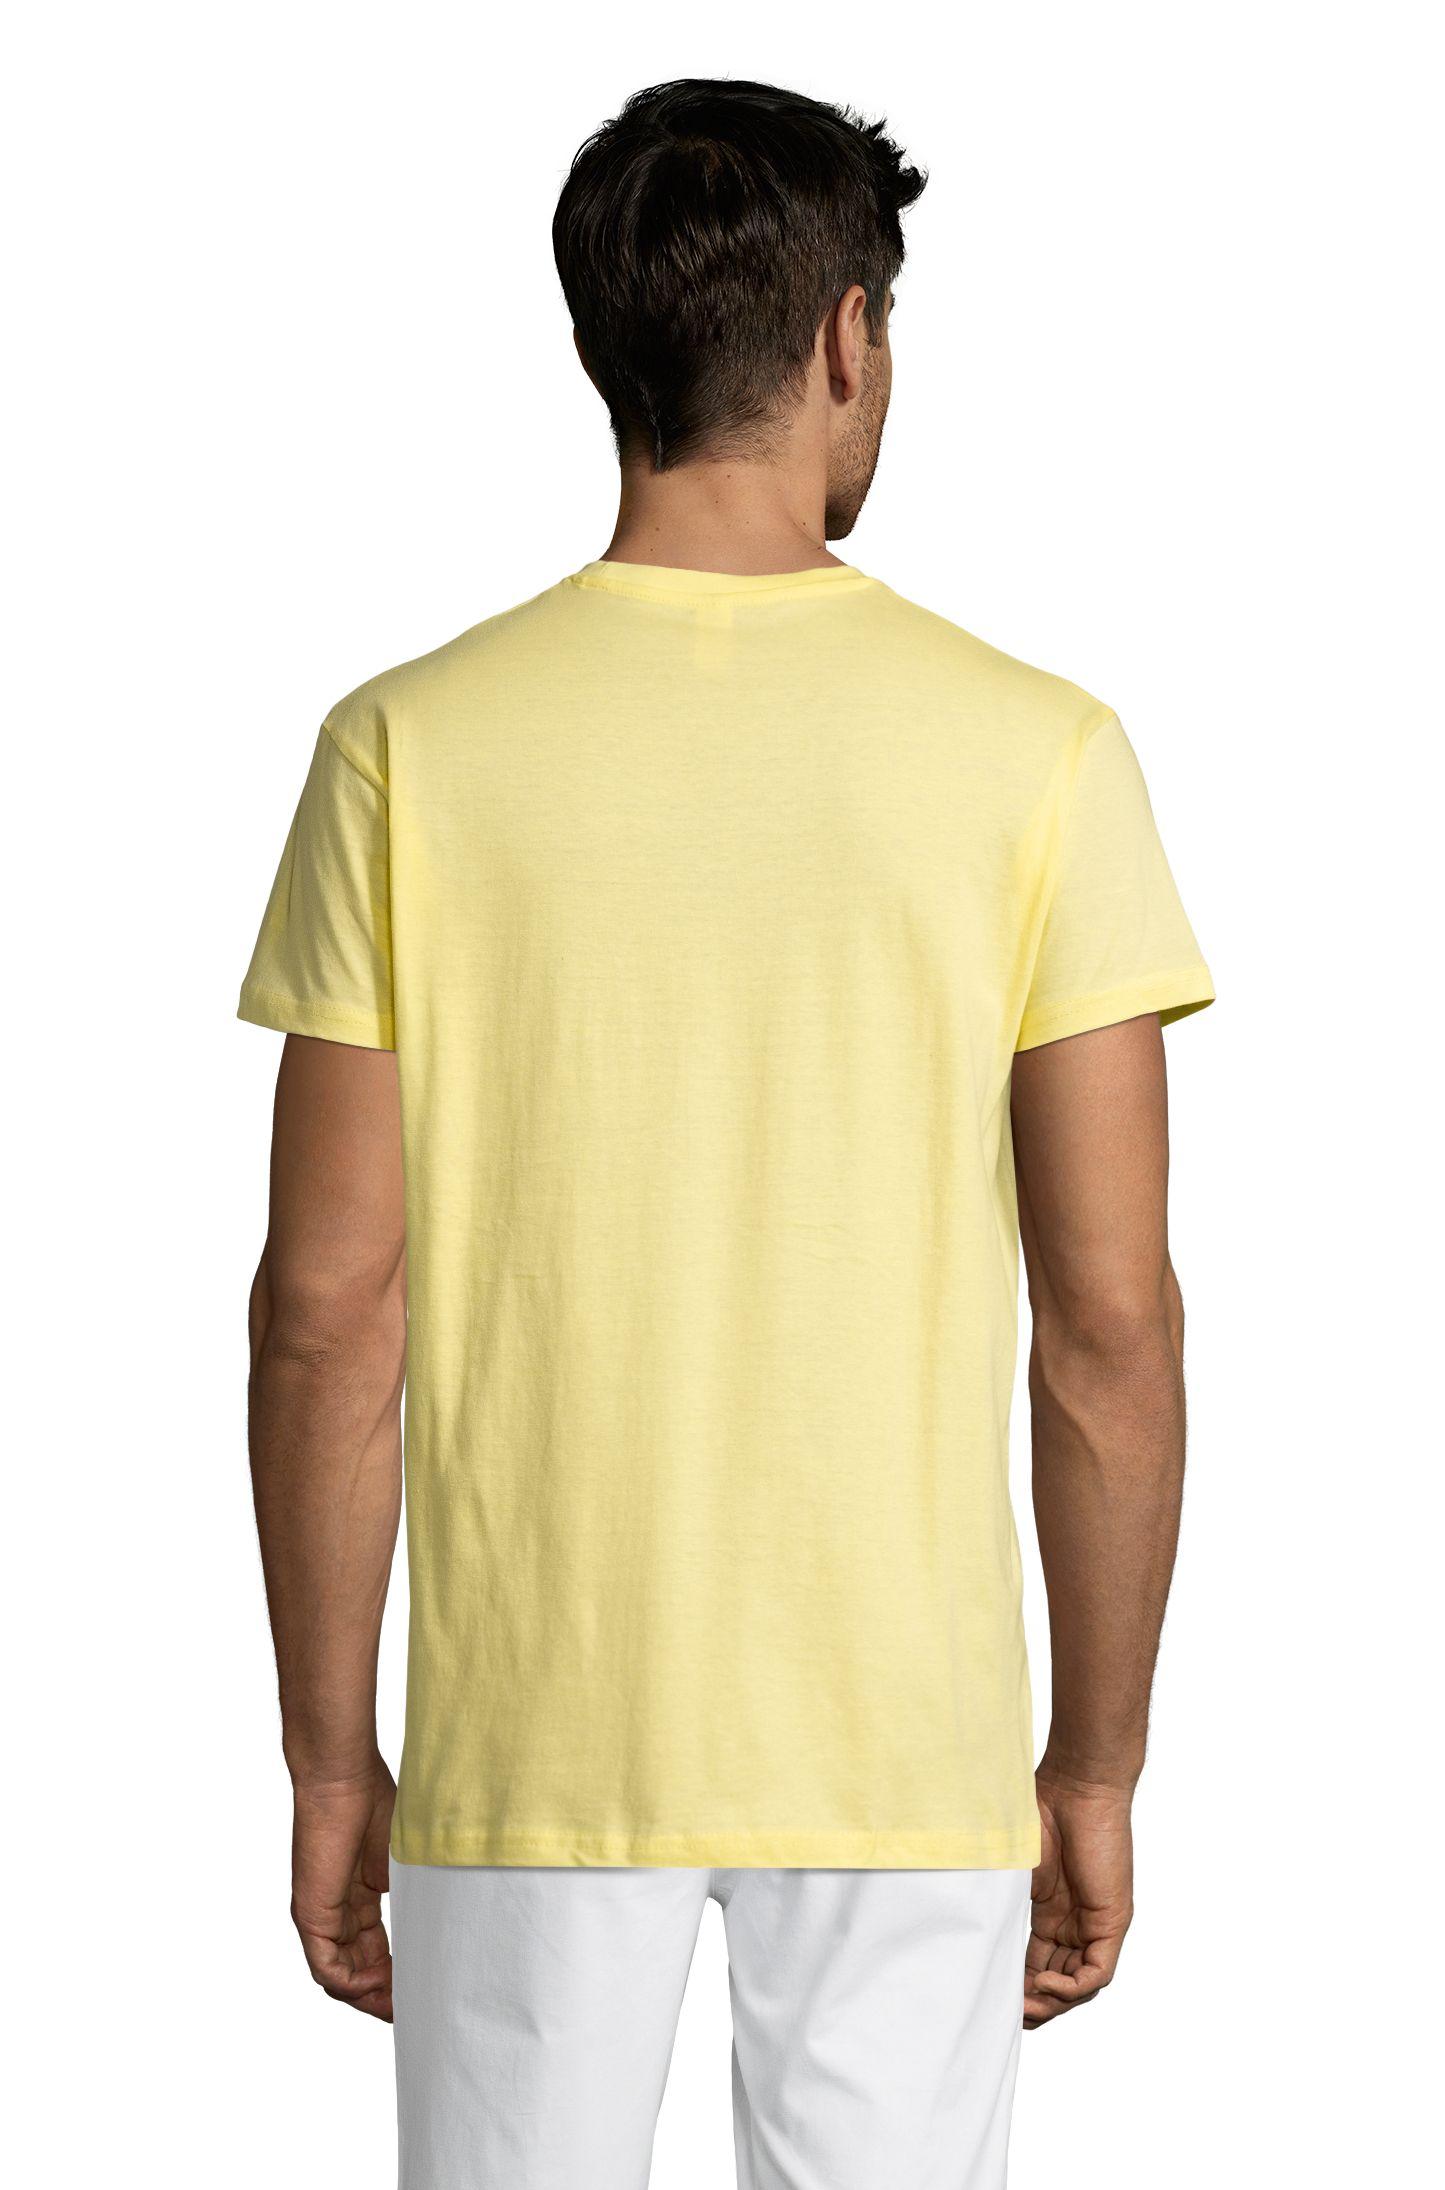 261 - Pale yellow